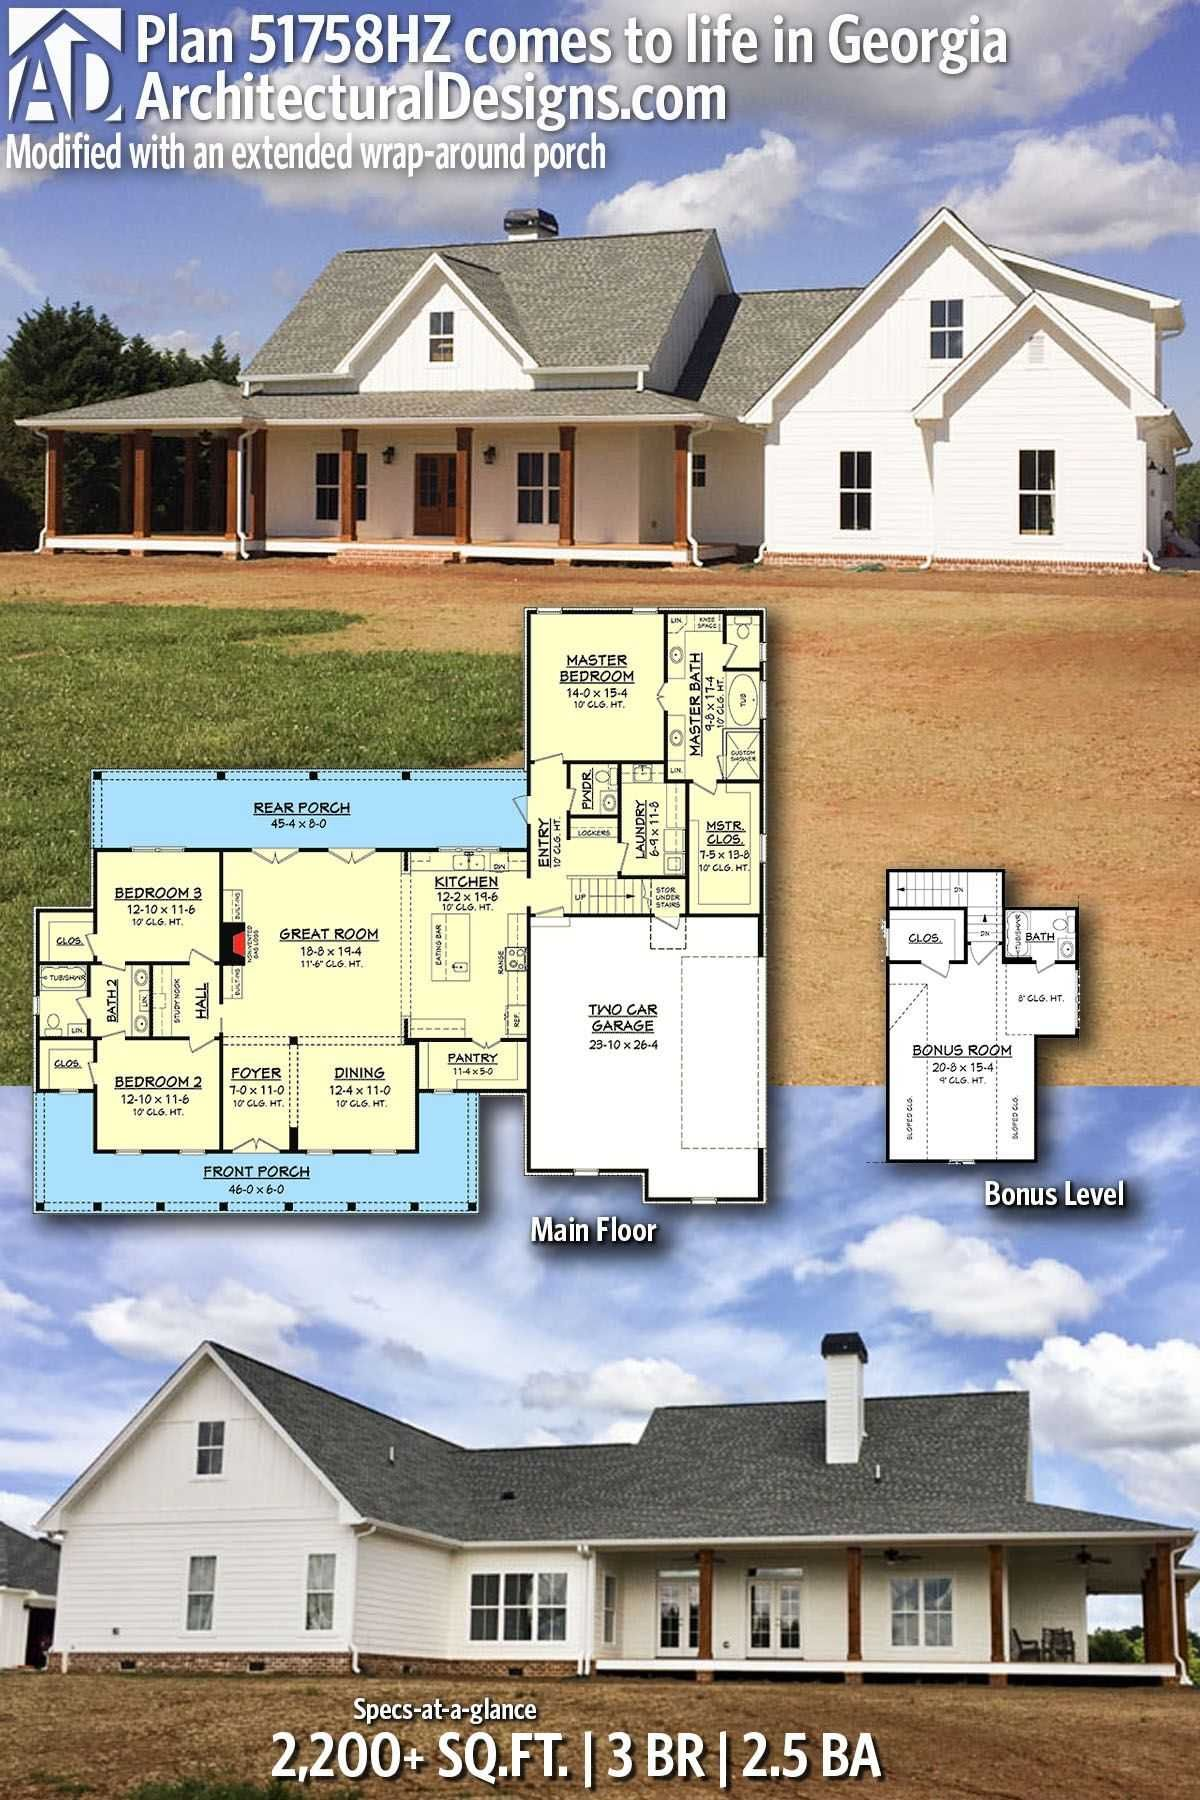 Single Story Wrap Around Porch : single, story, around, porch, Around, Porch, Modern, Story, Farmhouse, Plans, Beautiful, Farmh…, Floor, Plans,, House, Ranch